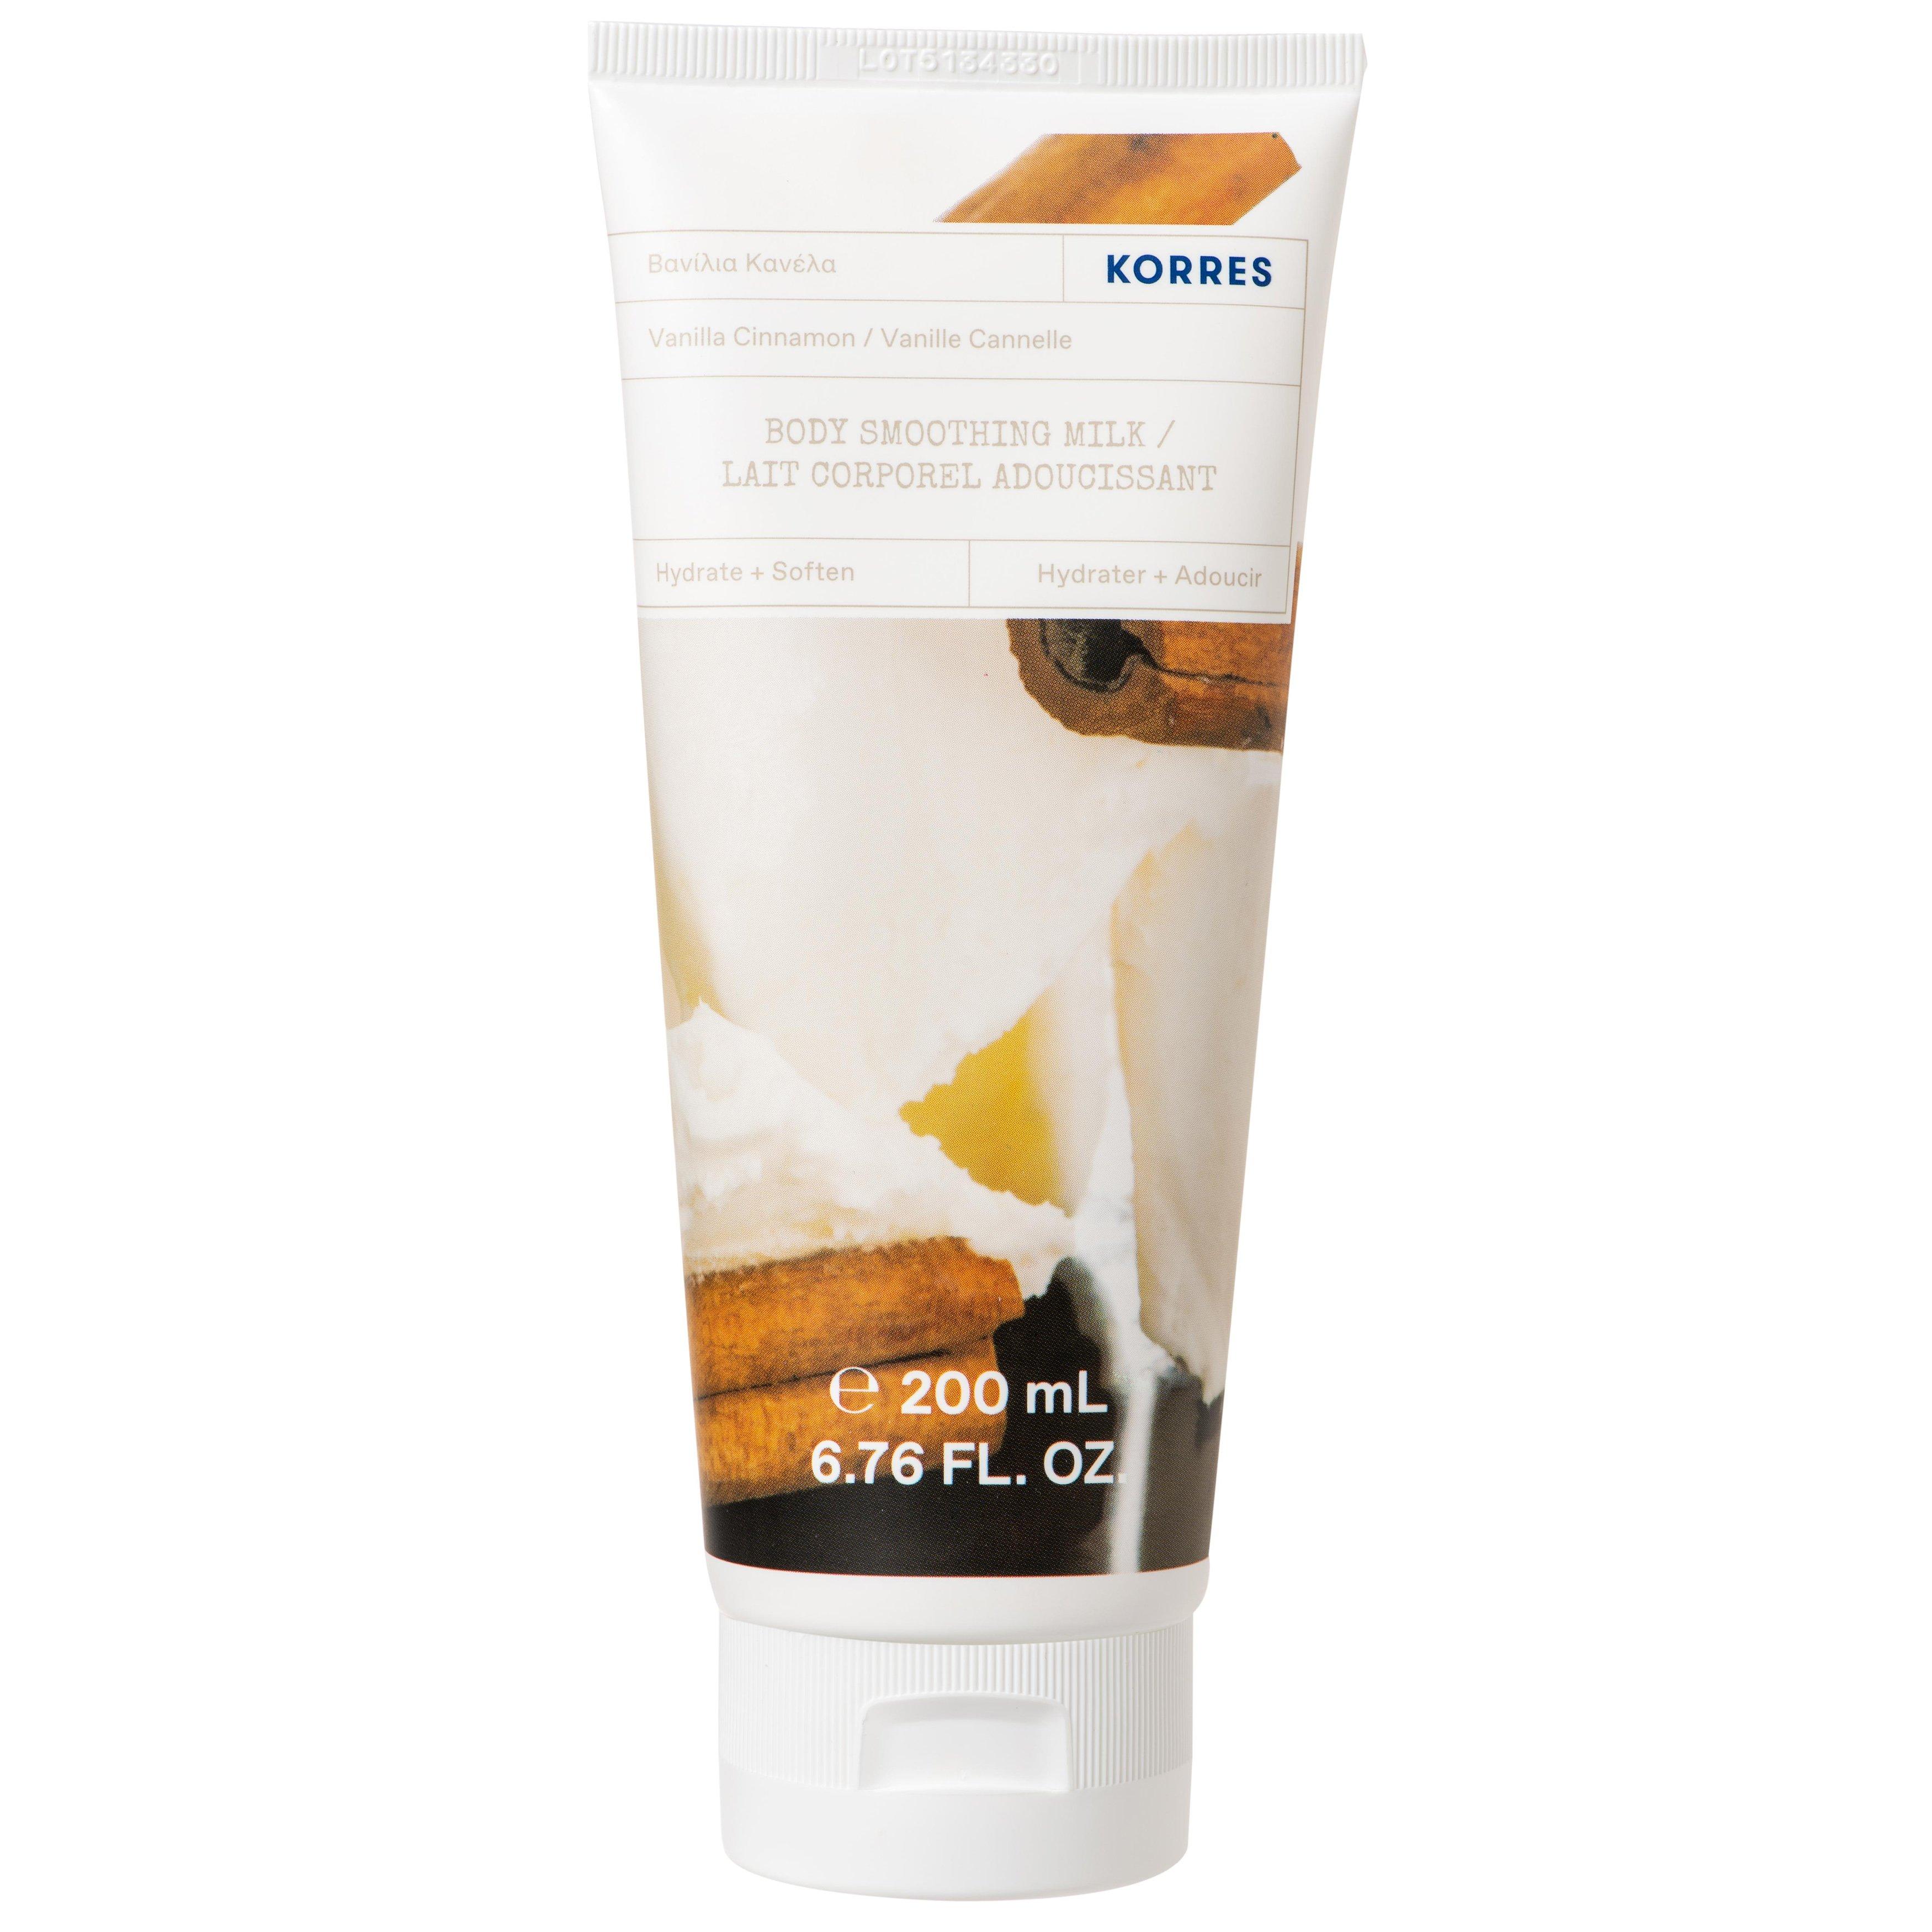 Korres Vanilla Cinnamon Body Smoothing Milk Ενυδατικό Γαλάκτωμα Σώματος με Κρεμώδες Άρωμα Βανίλια Κανέλα 200ml